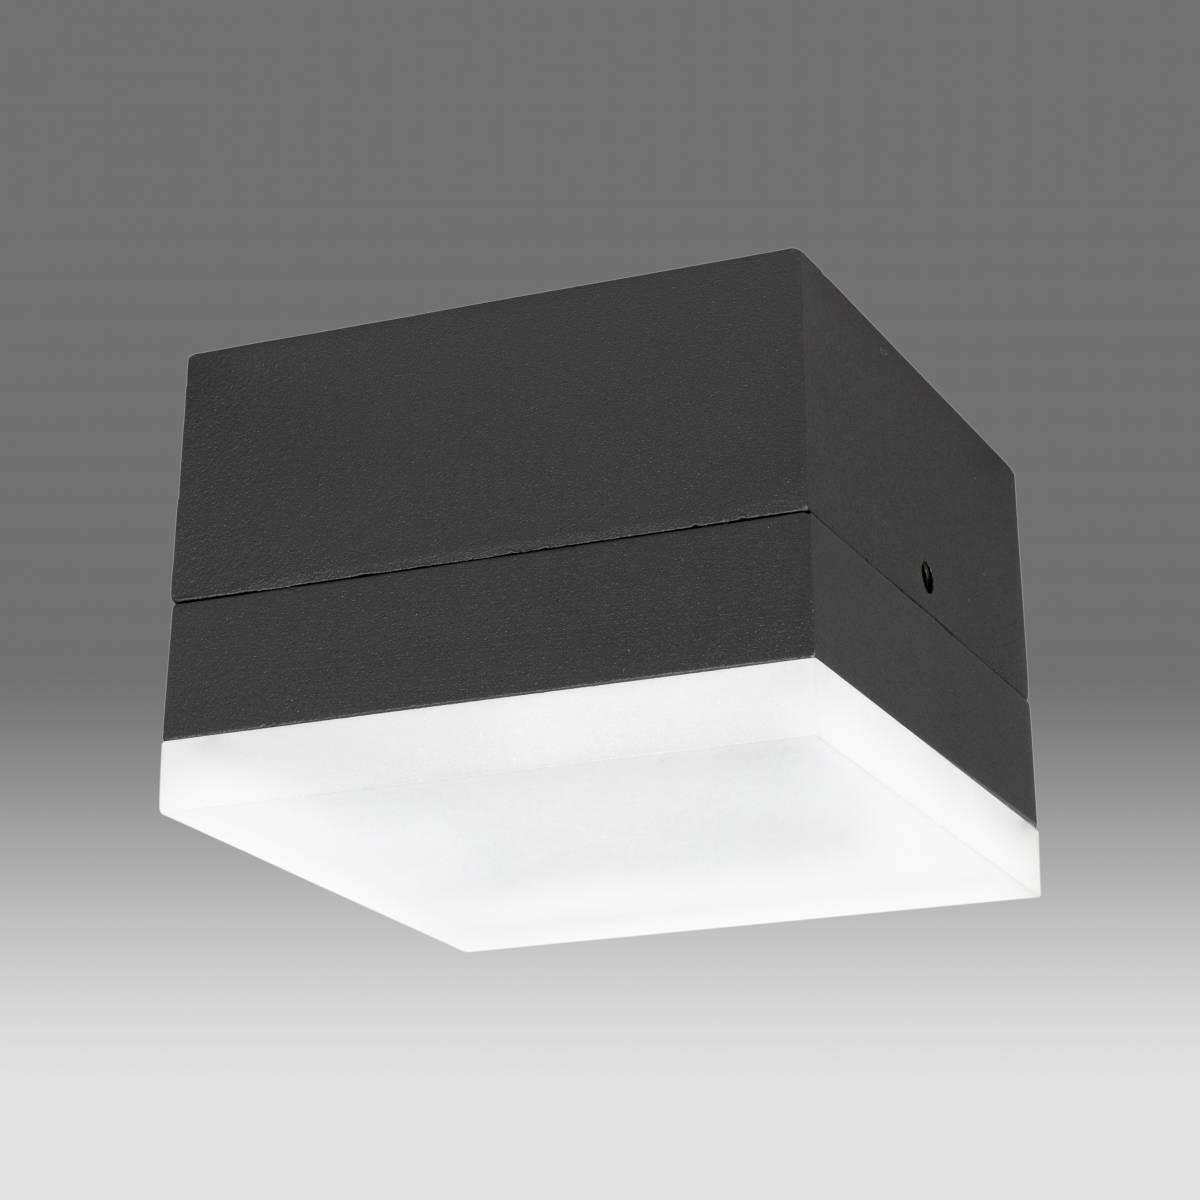 Zelda LED Square Medium 10W 650lm 3000K IP54 anthracite